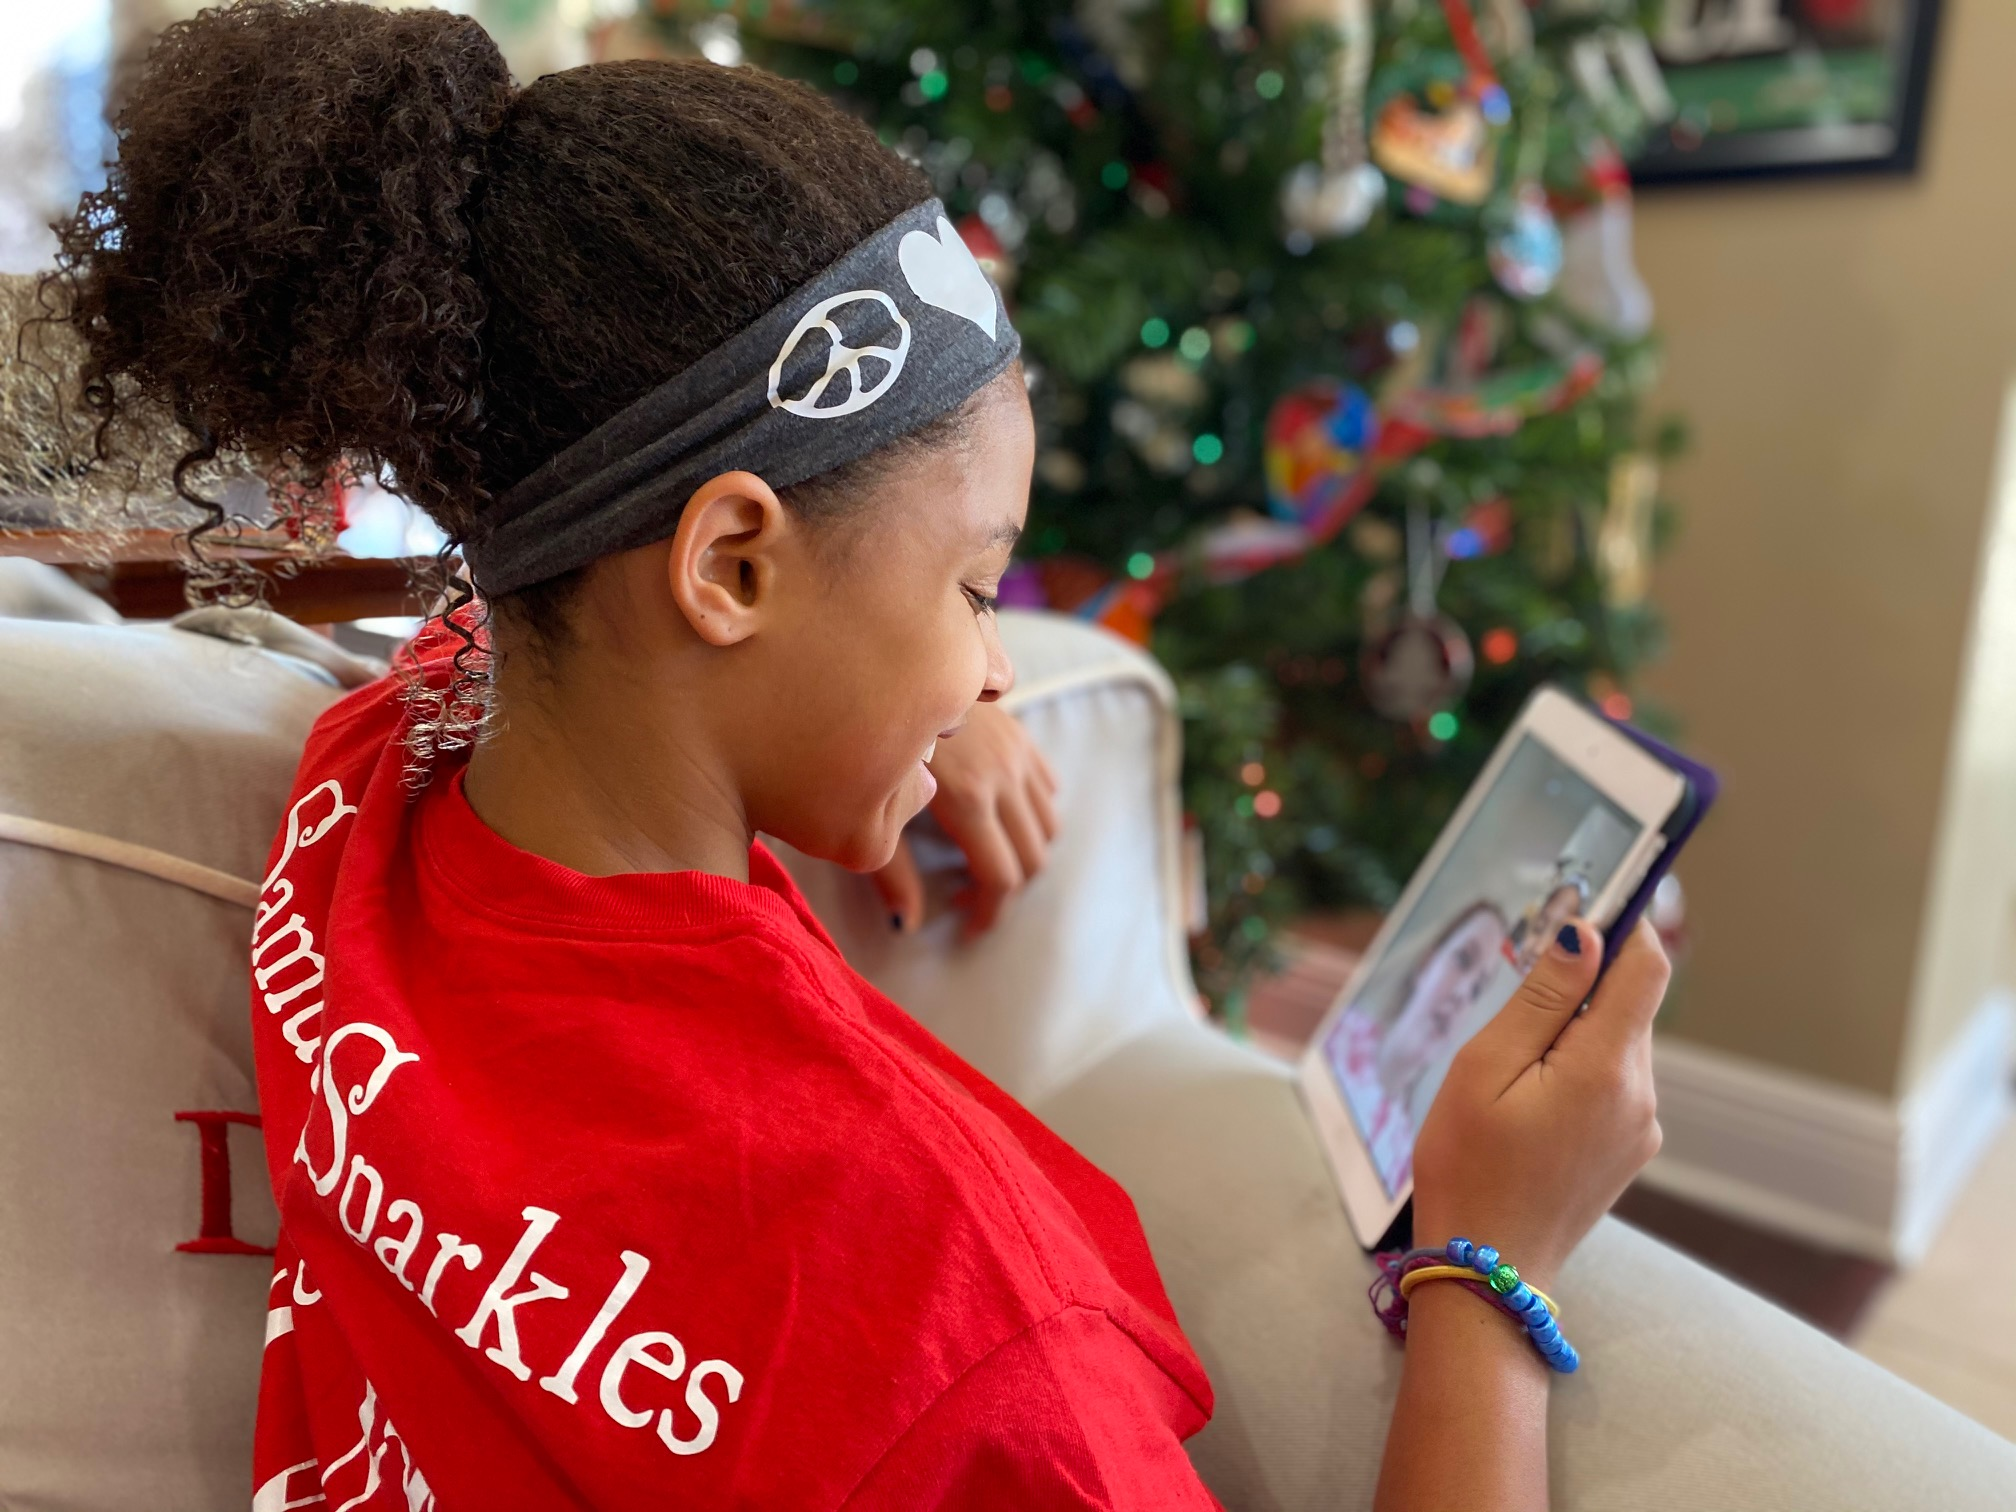 child enjoying app on tablet